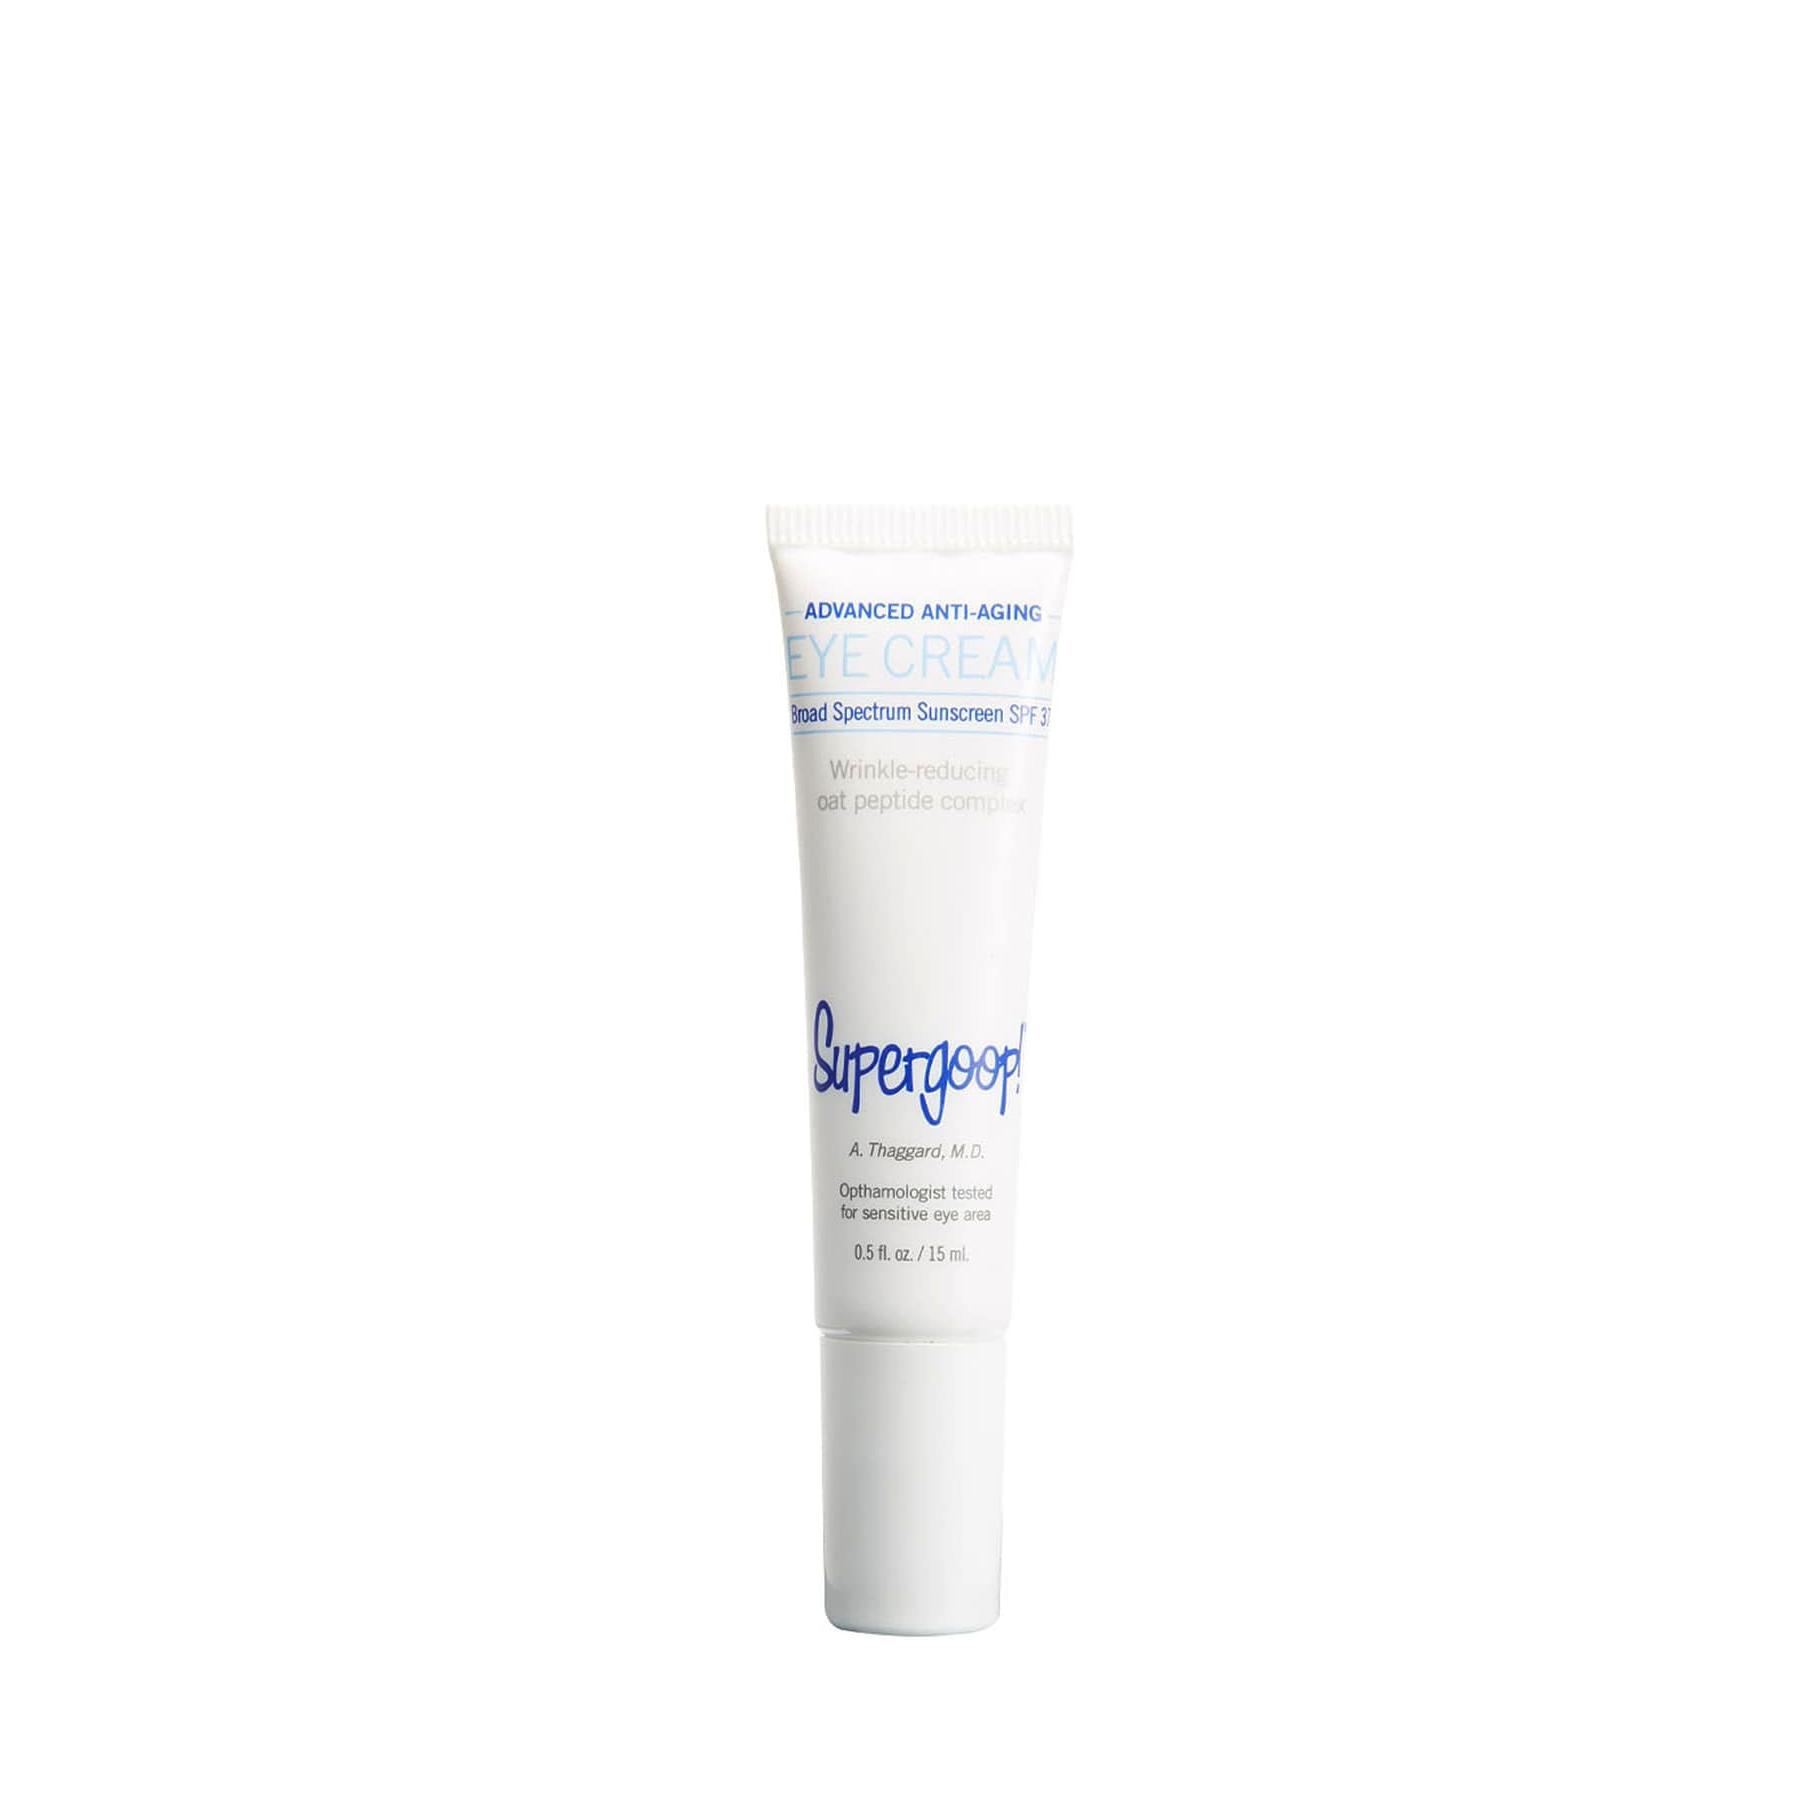 Advanced Anti-Aging Eye Cream